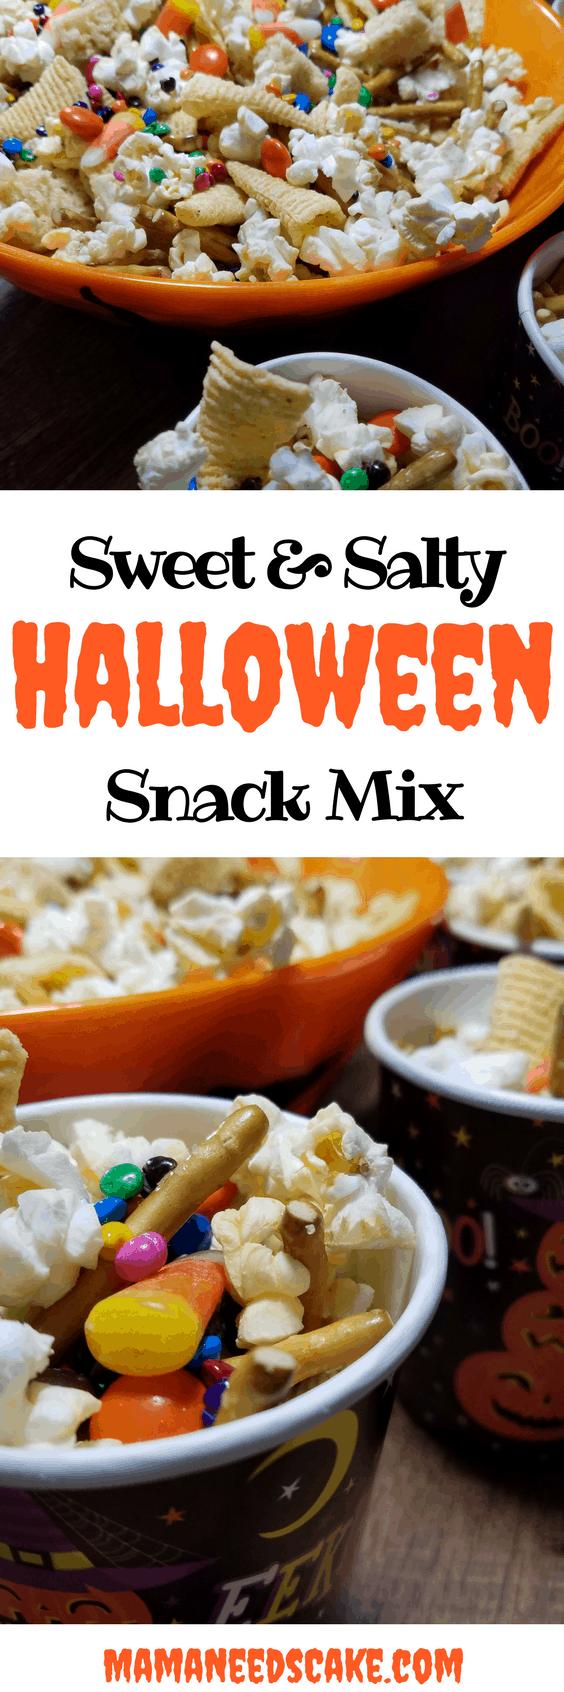 Sweet Amp Salty Halloween Snack Mix Mama Needs Cake Nut